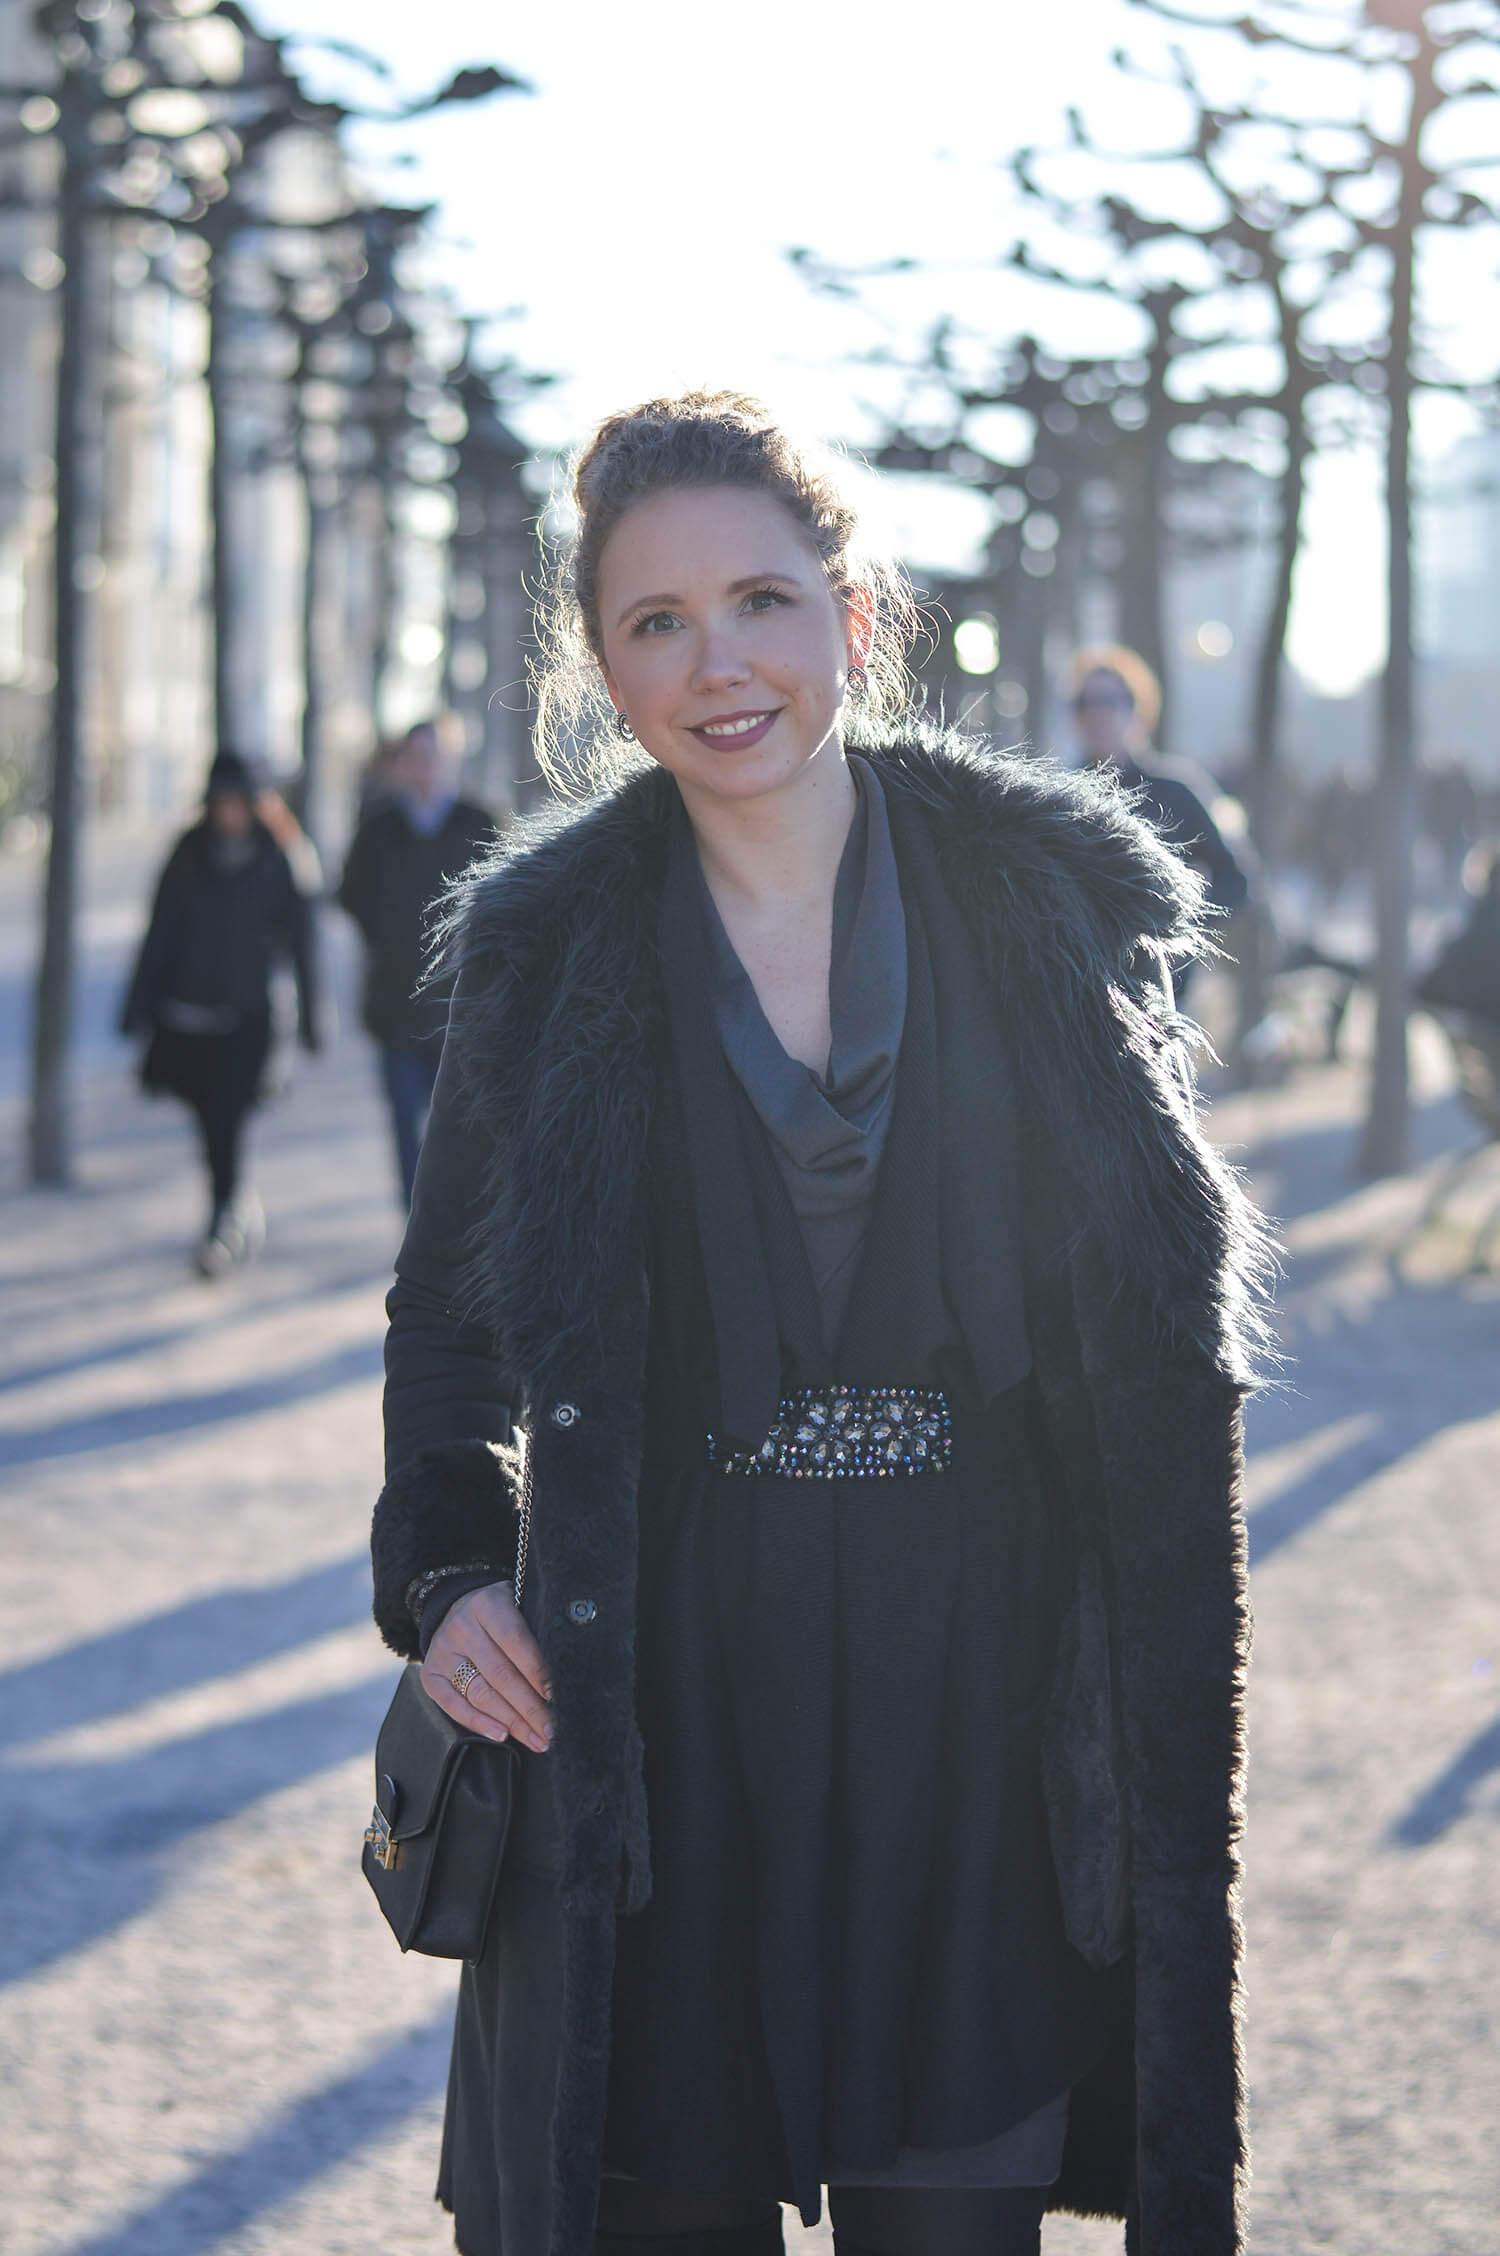 Kationette-fashionblog-Outfit-Shadesofgrey-Shearling-Knit-Overknees-Dusseldorf-curls